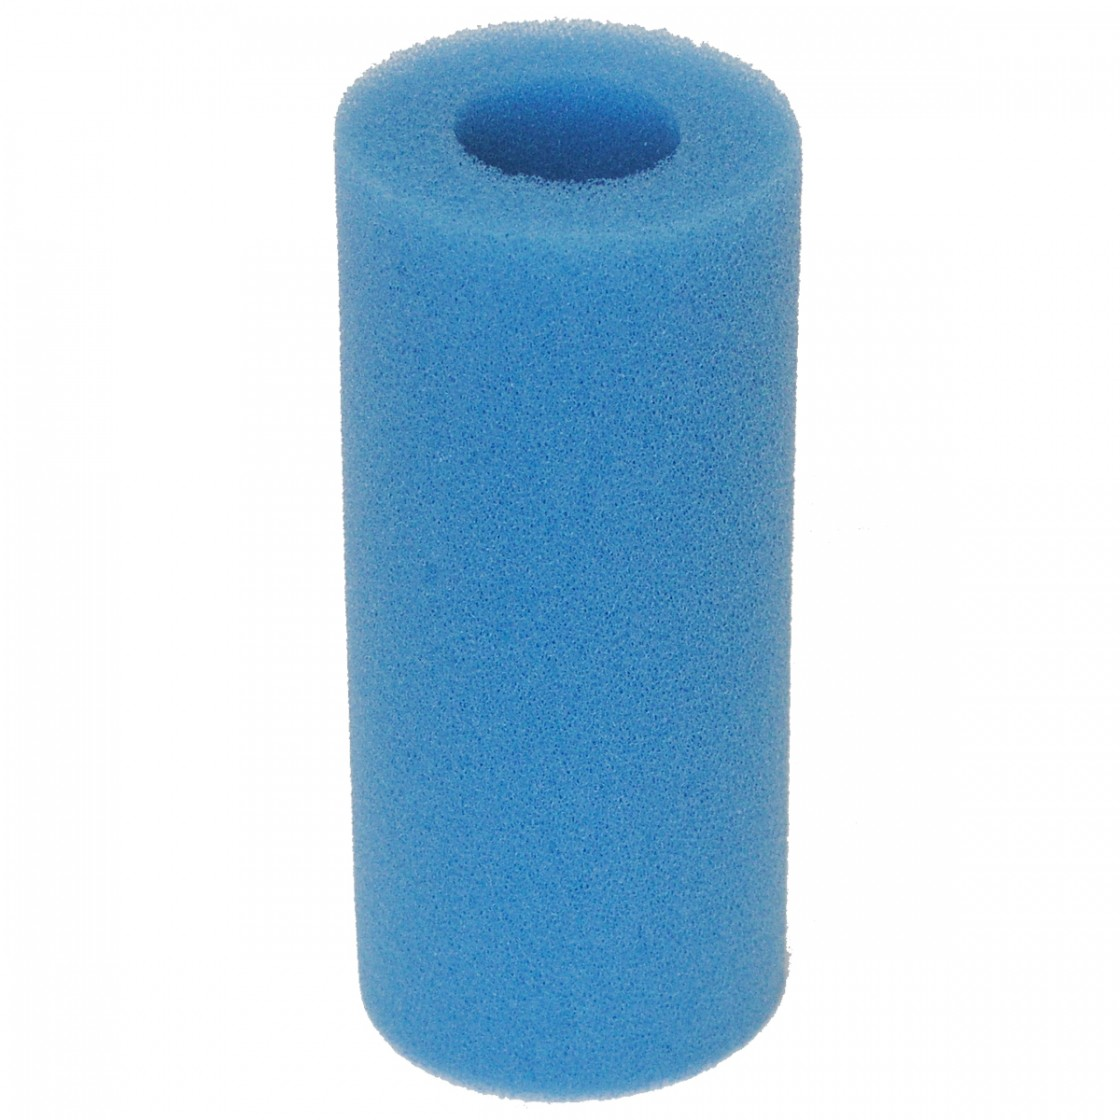 Tunze Foam cartridge